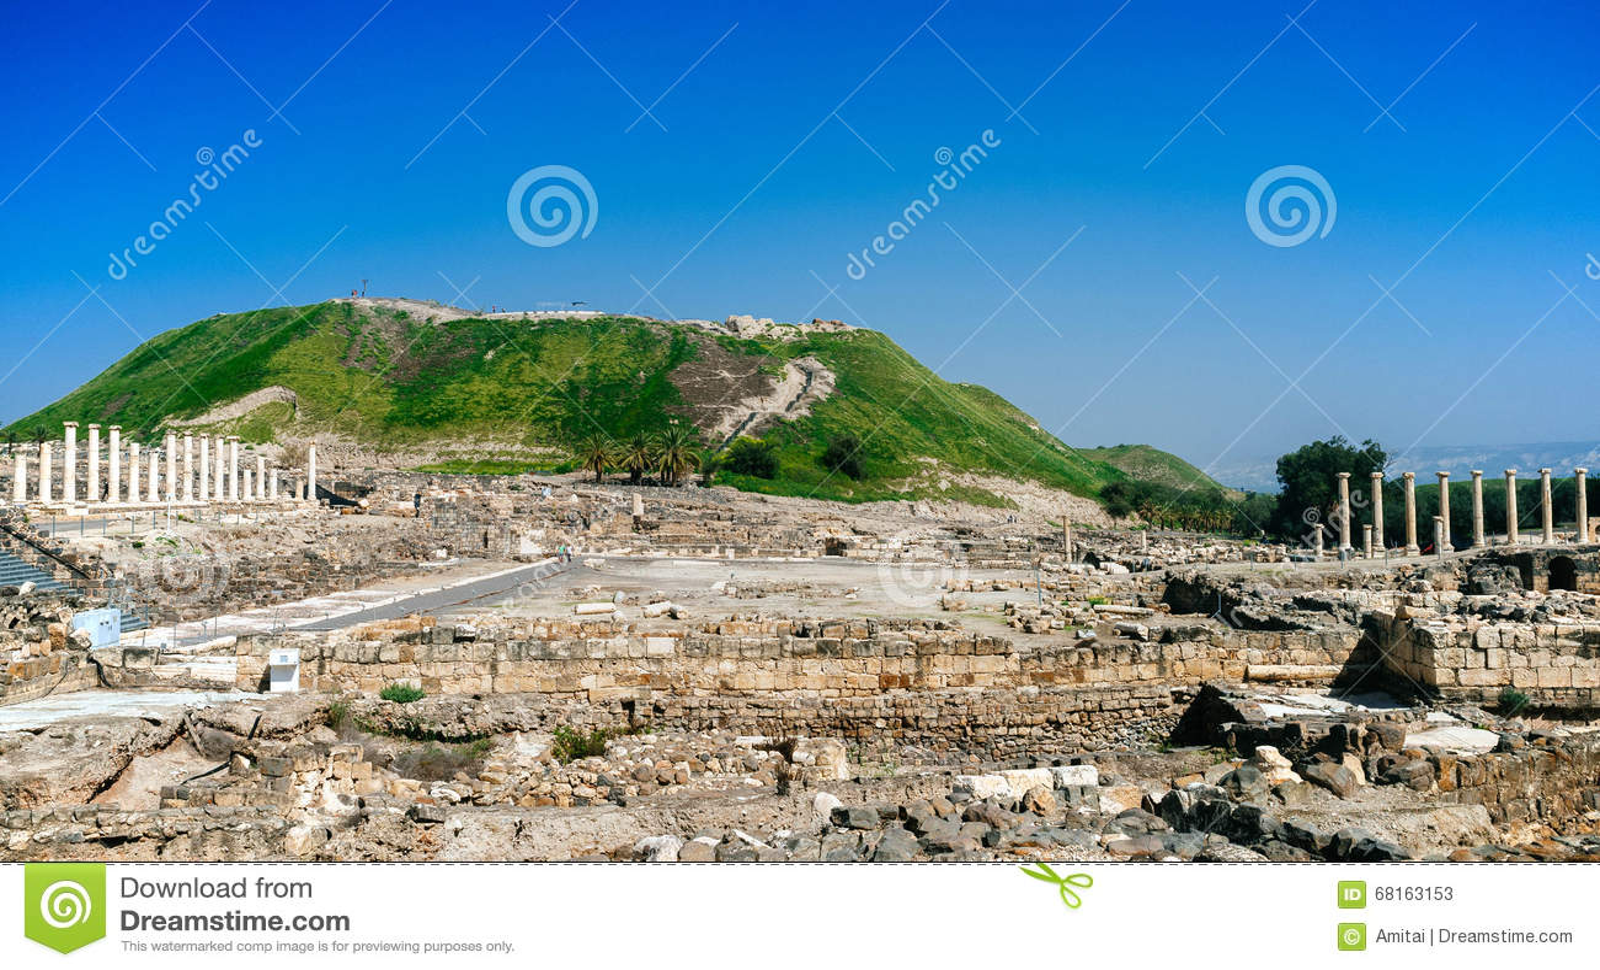 Série da Terra Santa - Beit Shean ruins#4